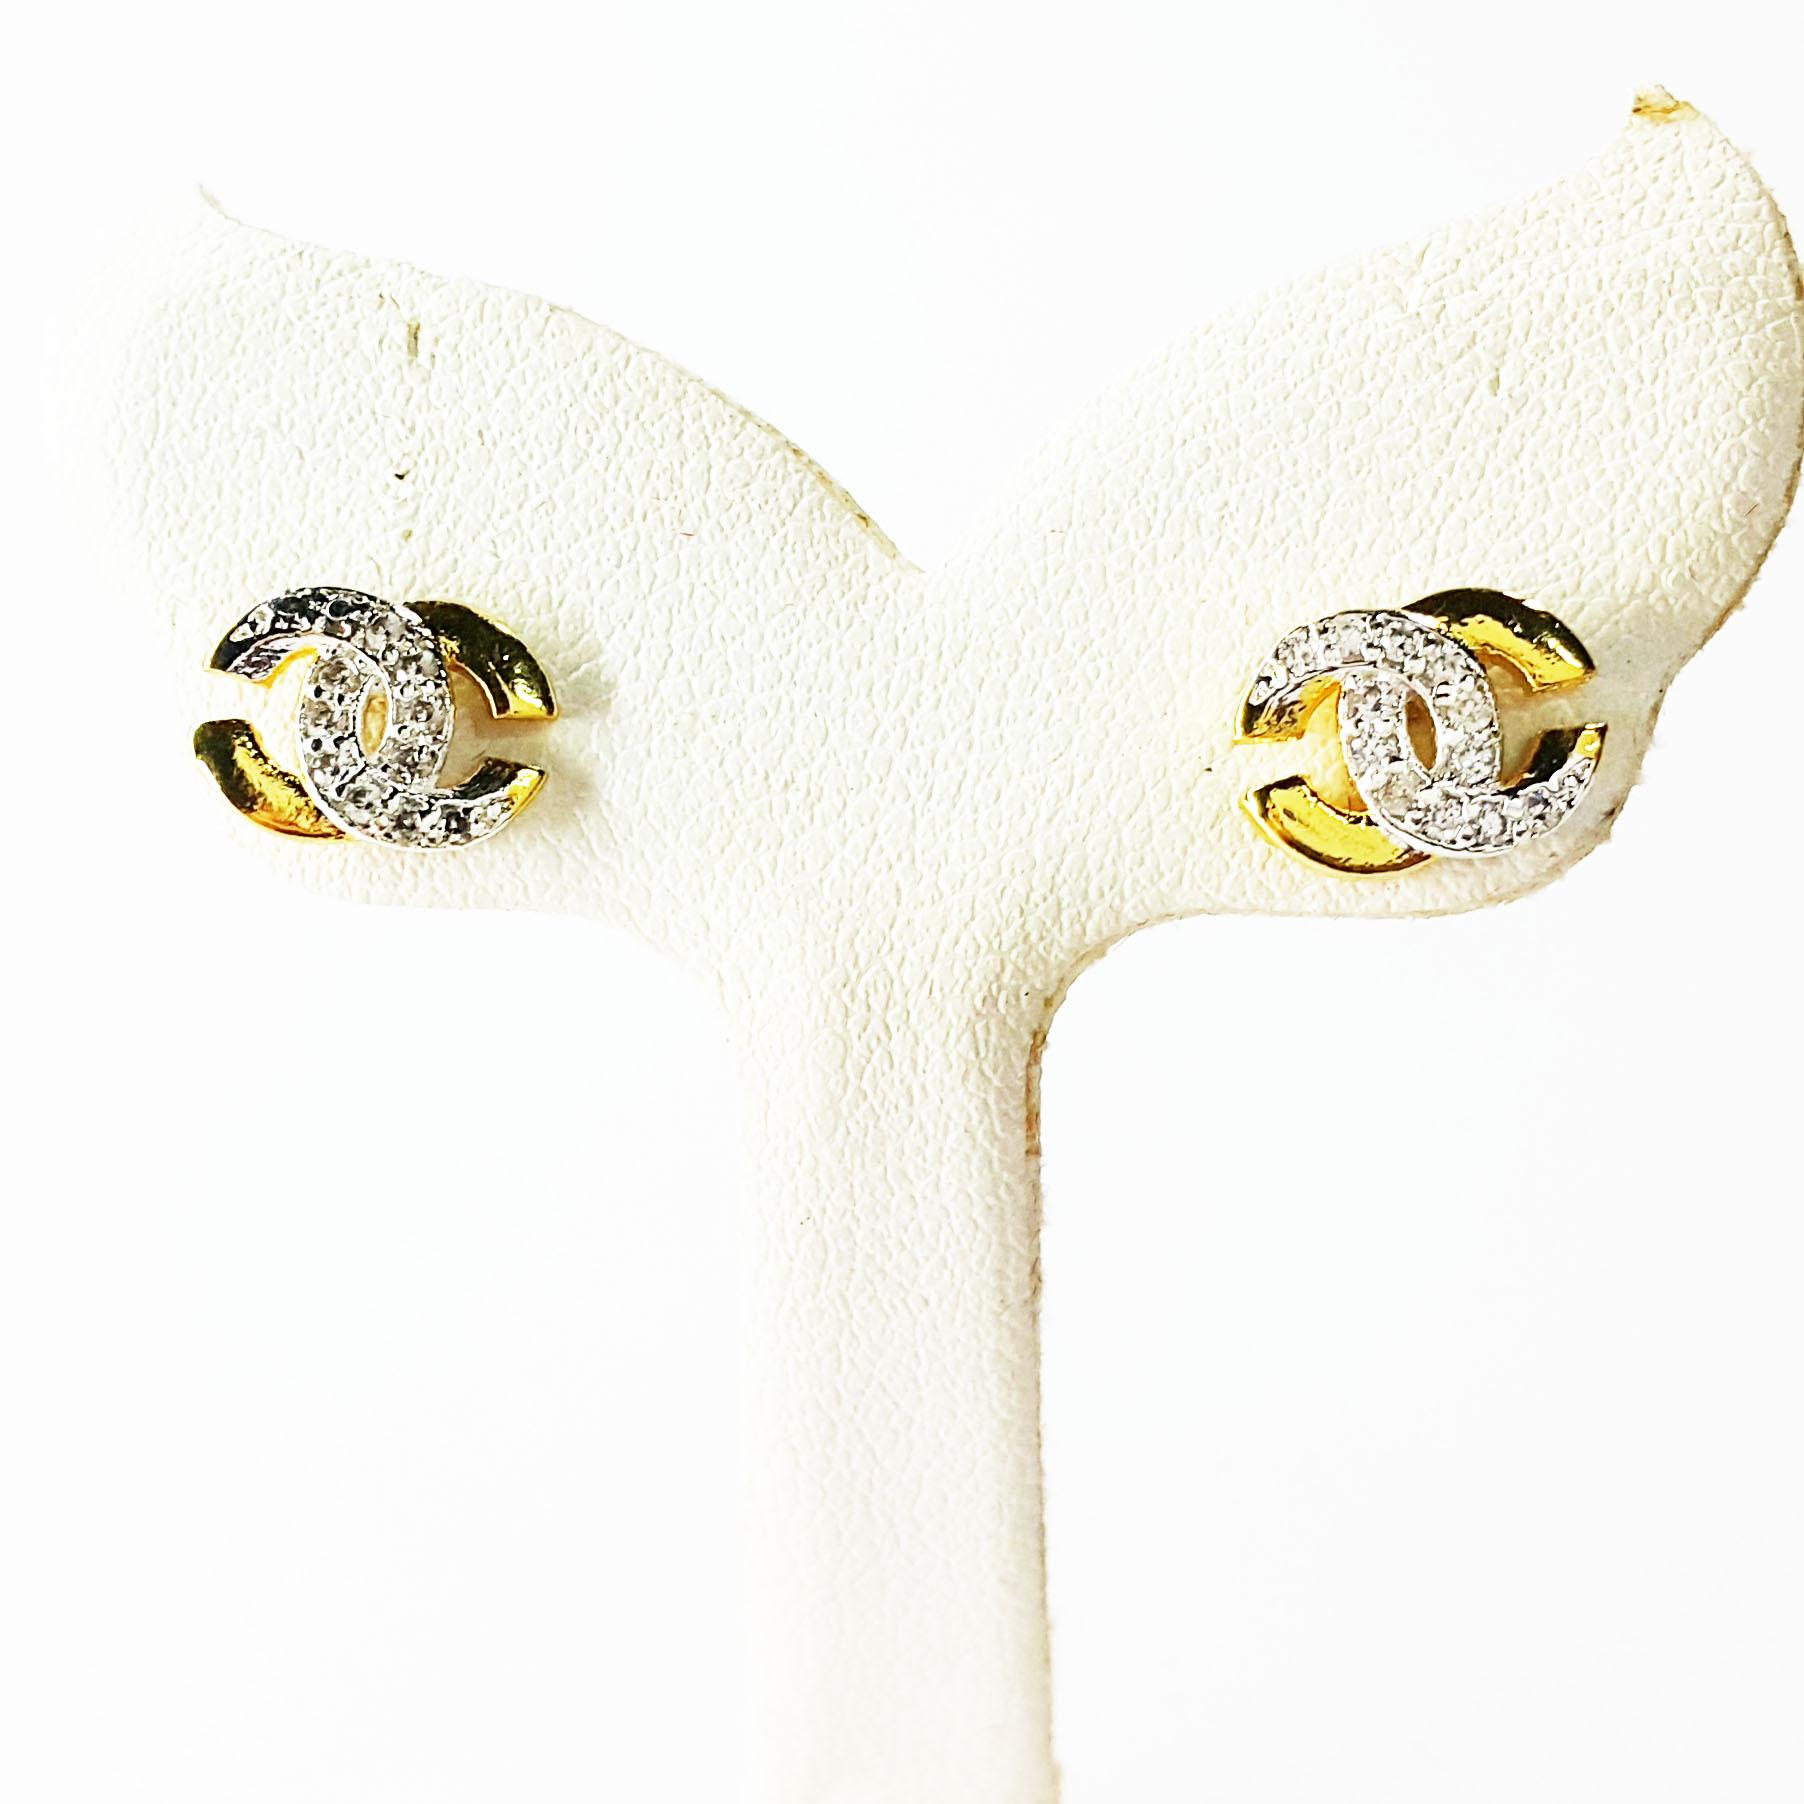 INSPIRE JEWELRY ต่างหู หุ้มทองแท้ 100% or gold plated ฝังเพชรสวิส